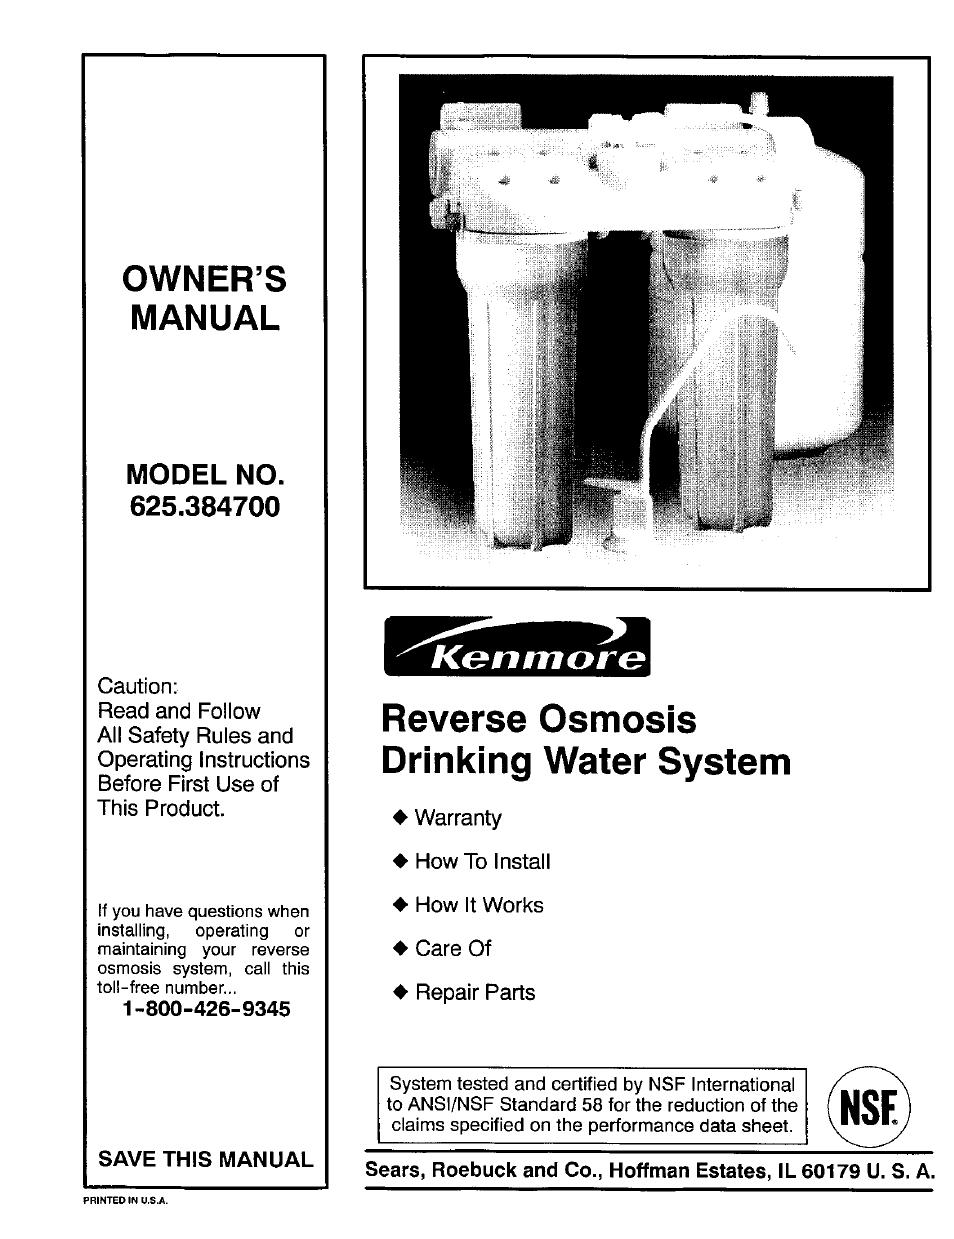 Kenmore-elite model 625385560 reverse osmosis genuine parts.